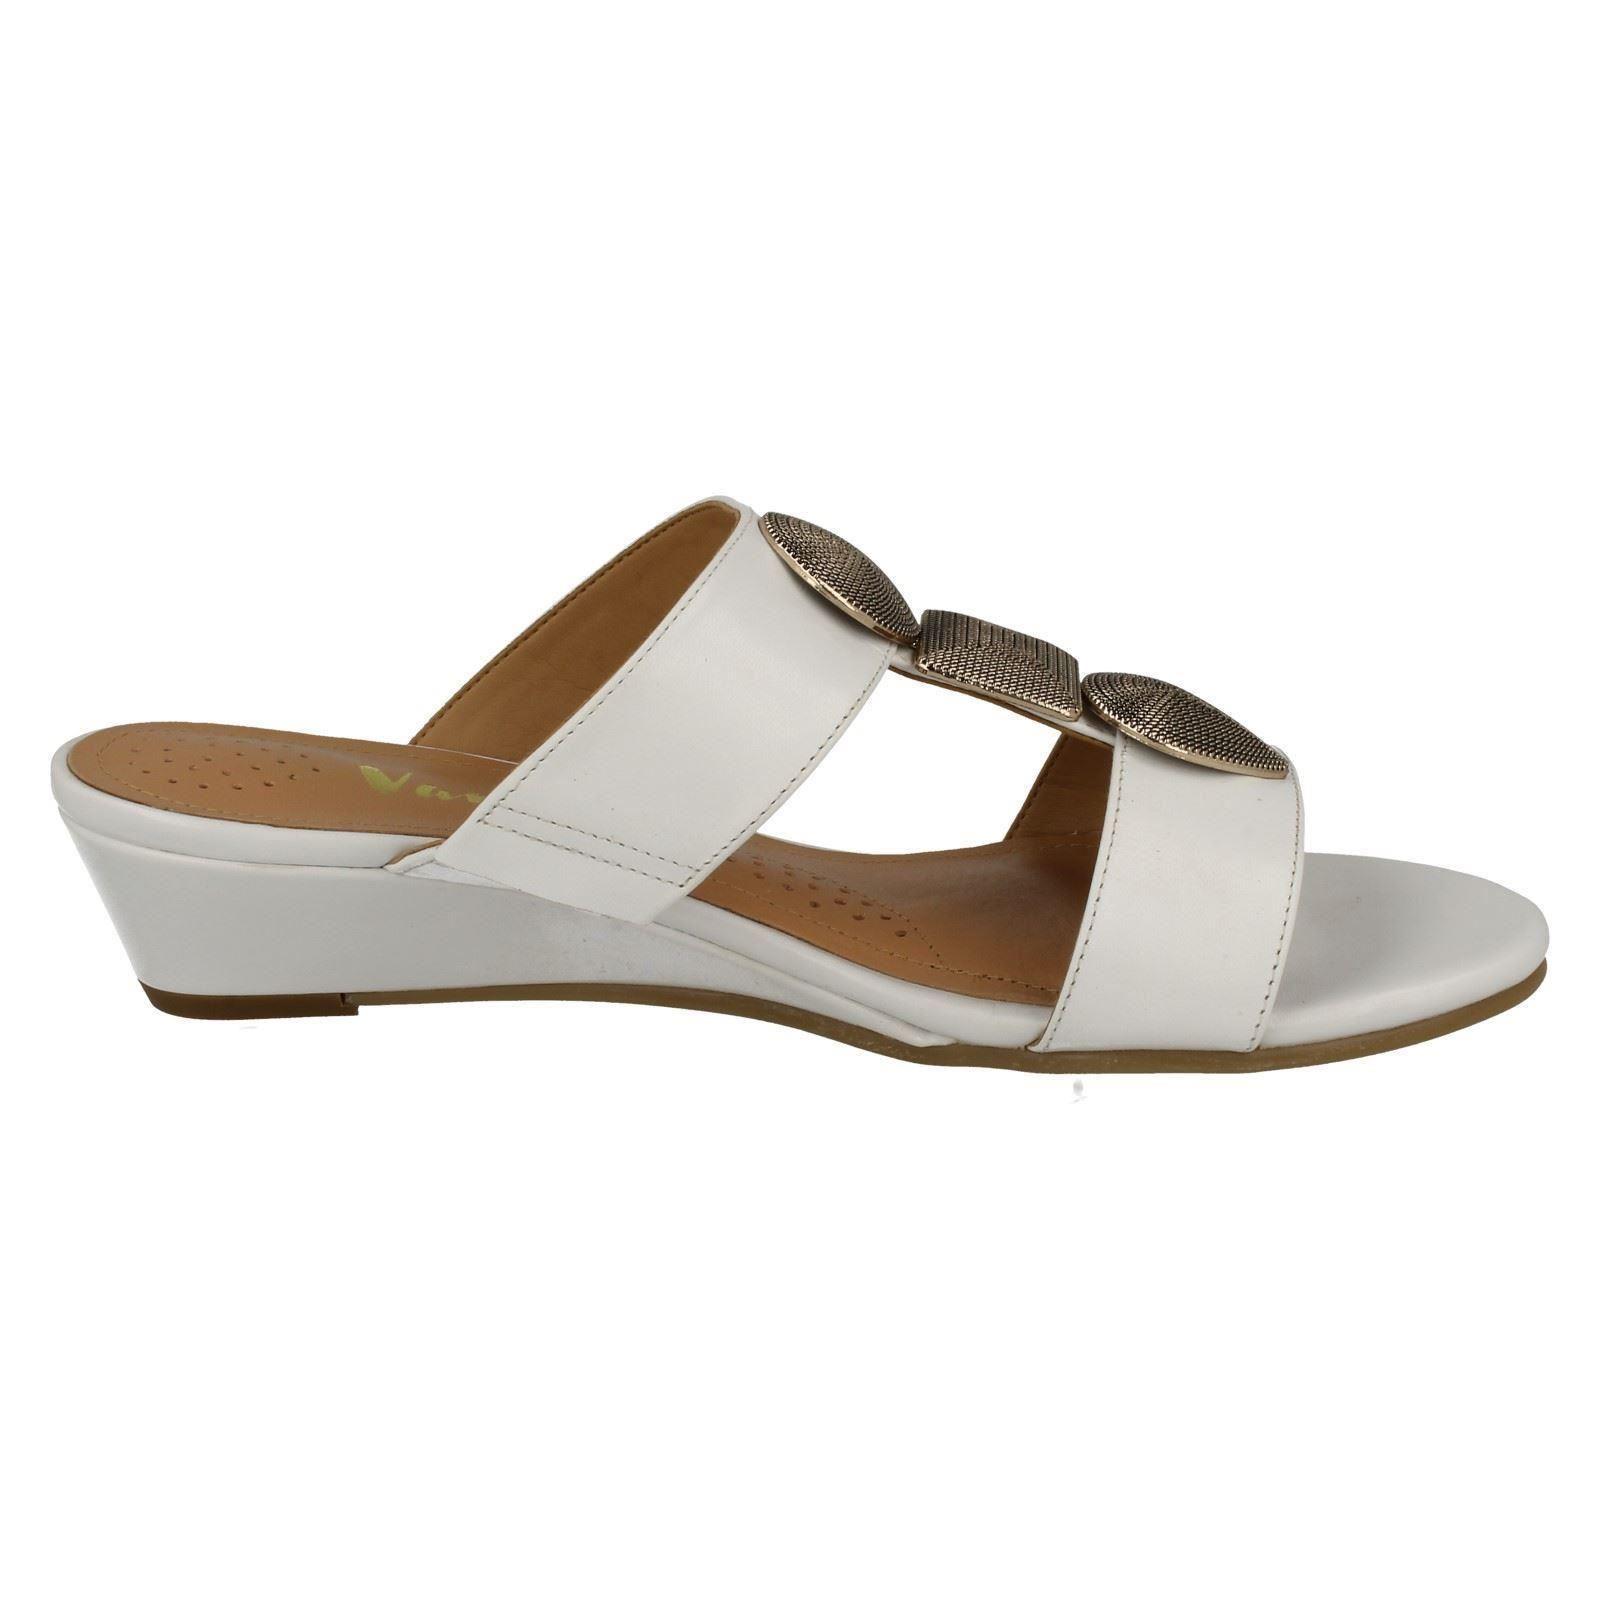 Ladies-Van-Dal-Open-Toe-Slip-On-Summer-Low-Wedge-Leather-Sandals-Epsom thumbnail 7